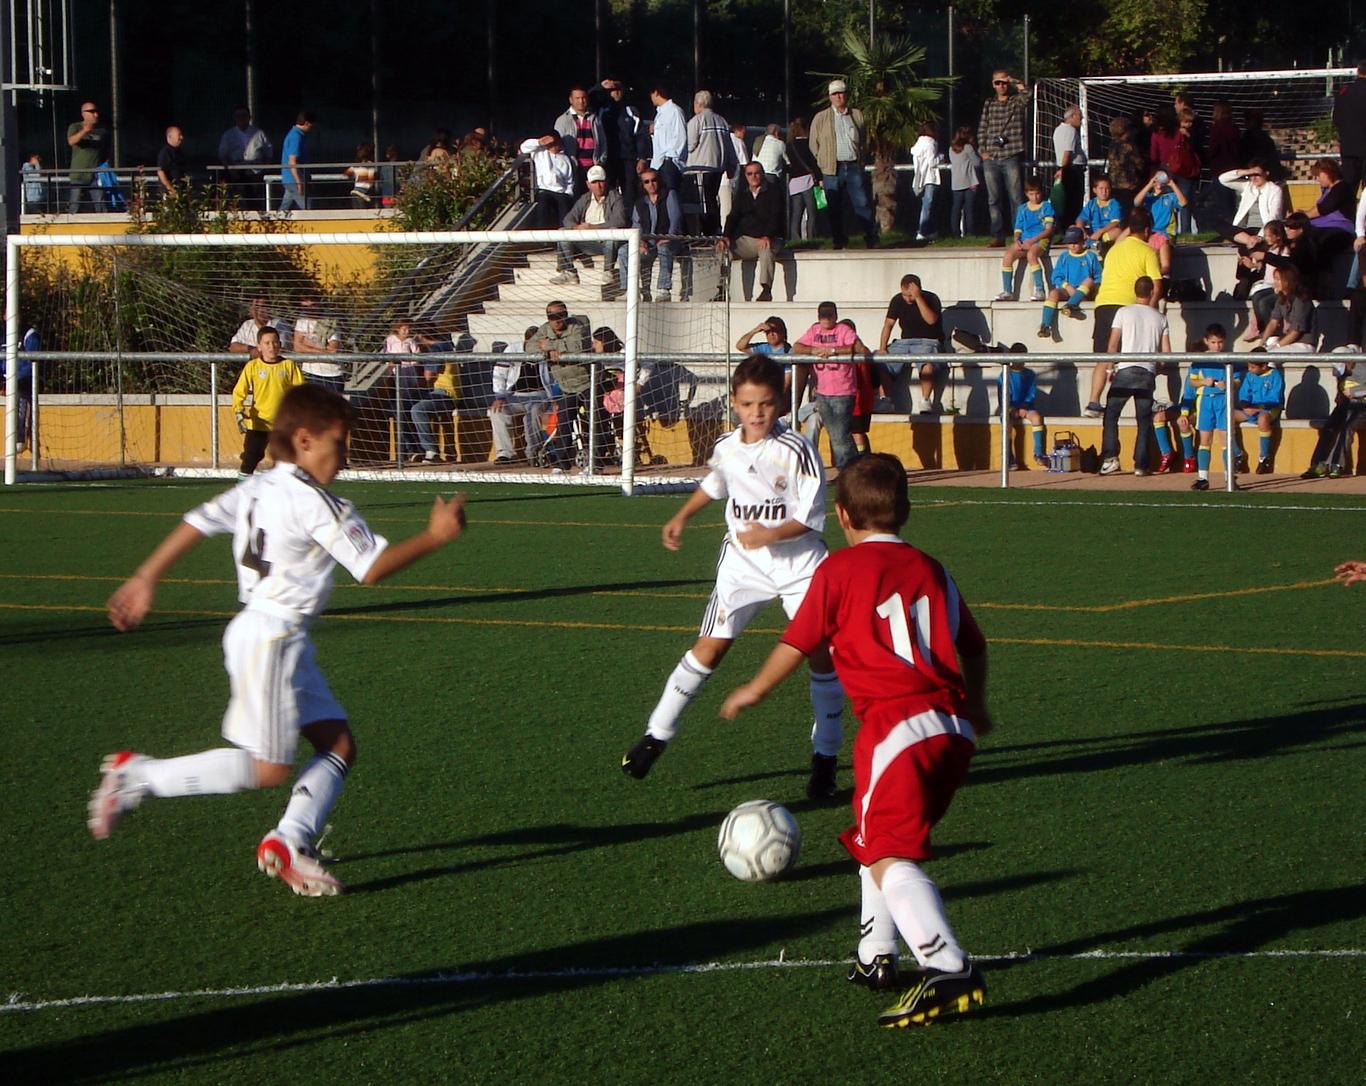 http://cdsannicasio.files.wordpress.com/2009/10/torneo1.jpg